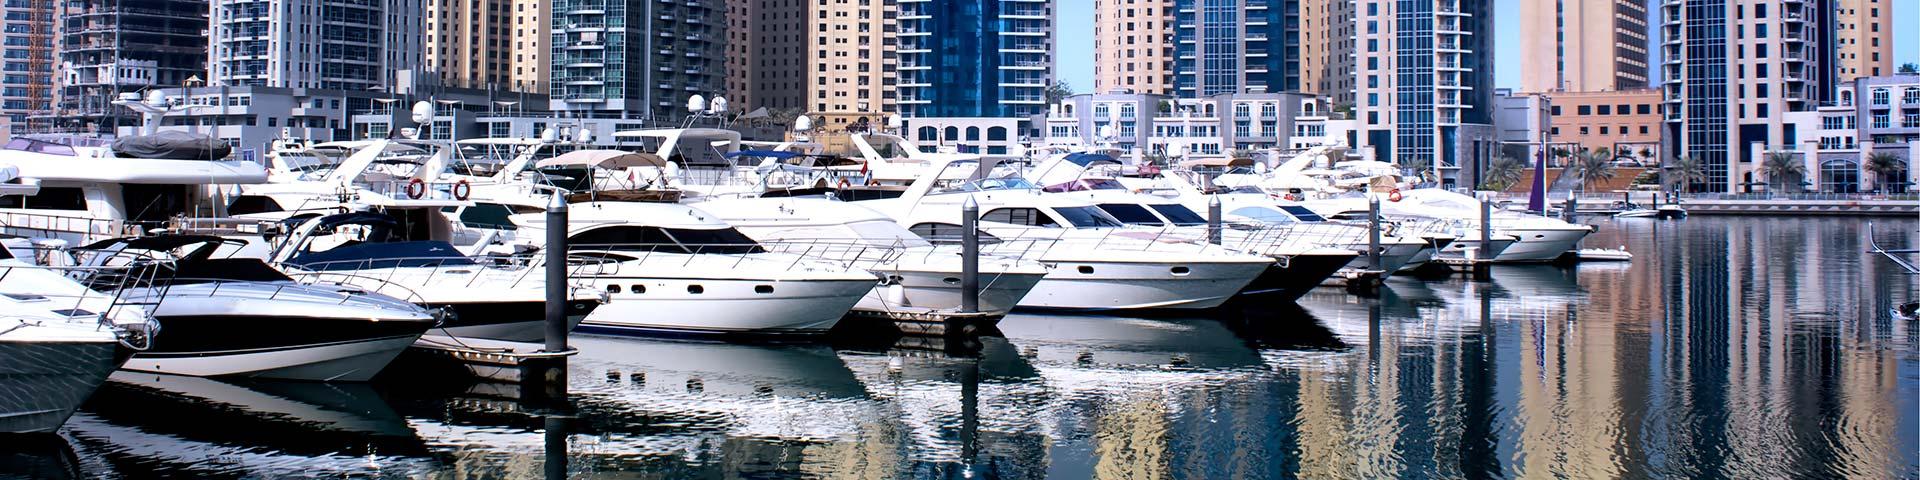 Yachting Dubai Marina